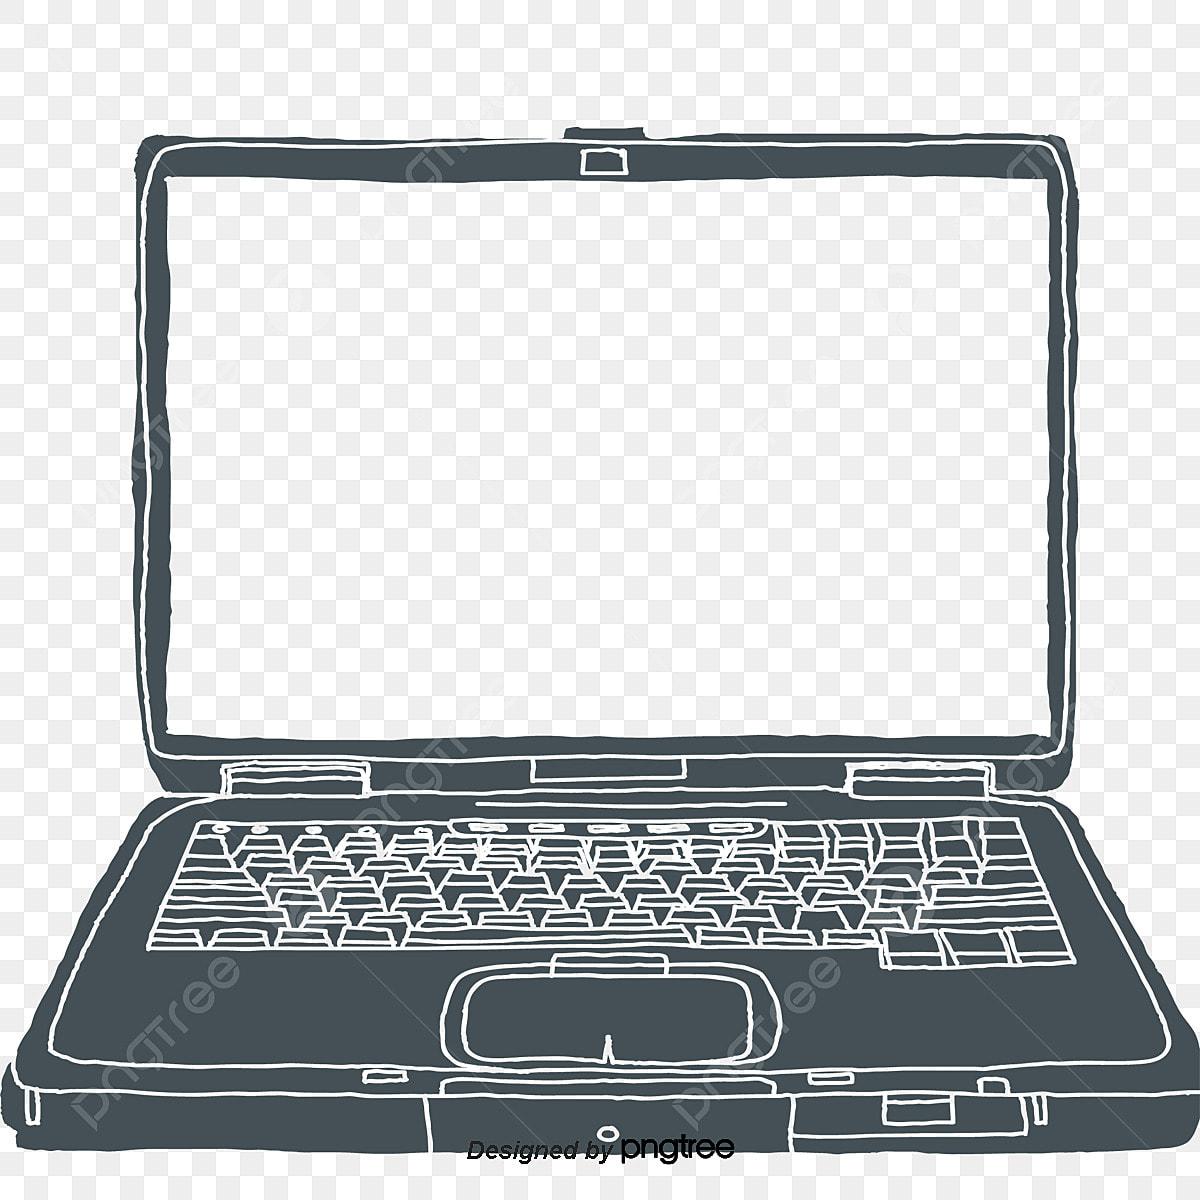 Gambar Komputer Riba Clipart